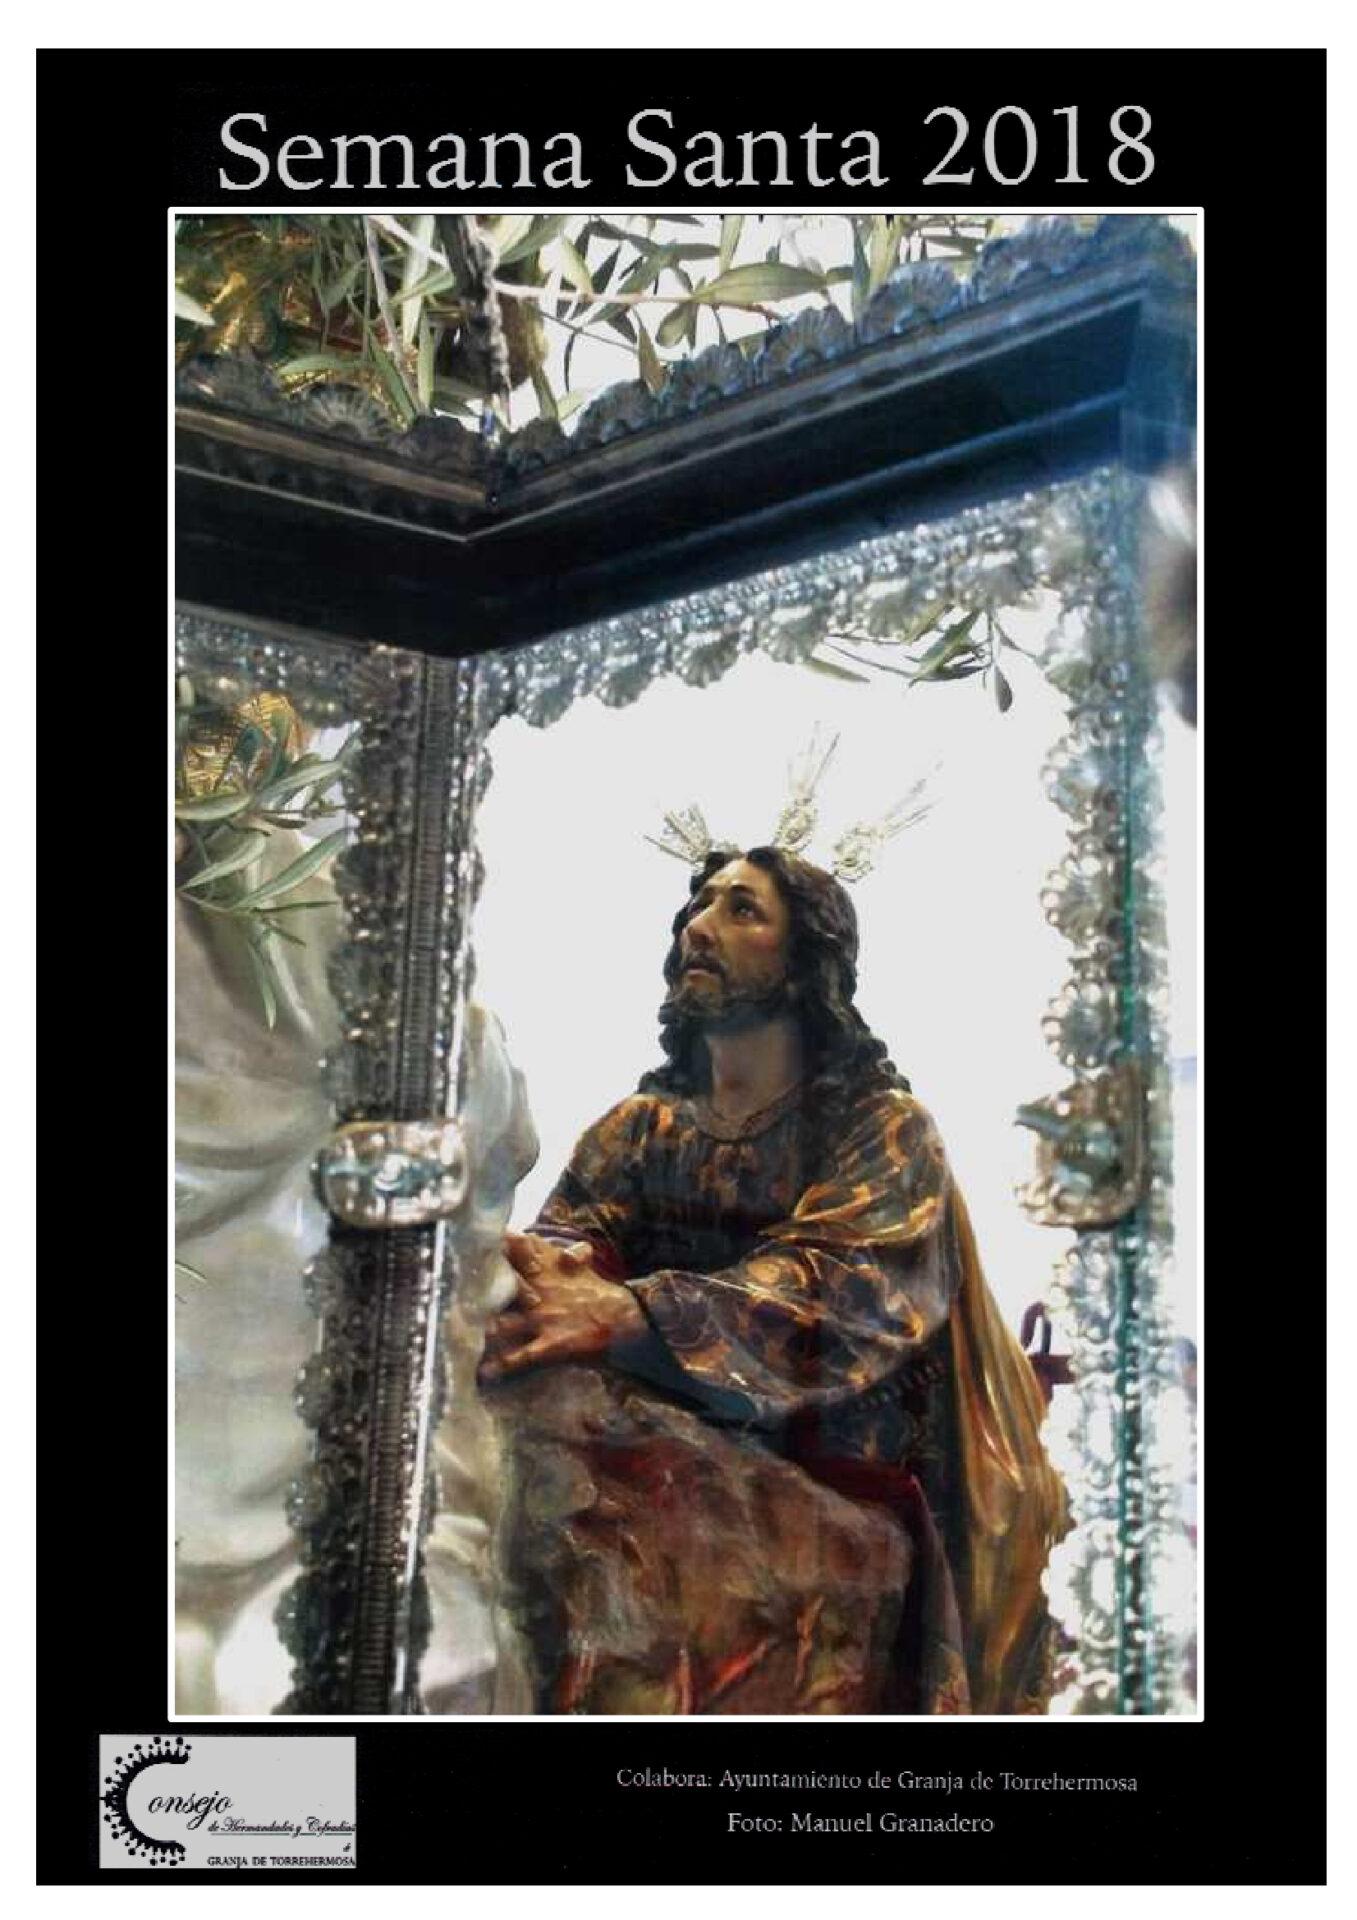 Semana Santa 2018 Granja de Torrehermosa